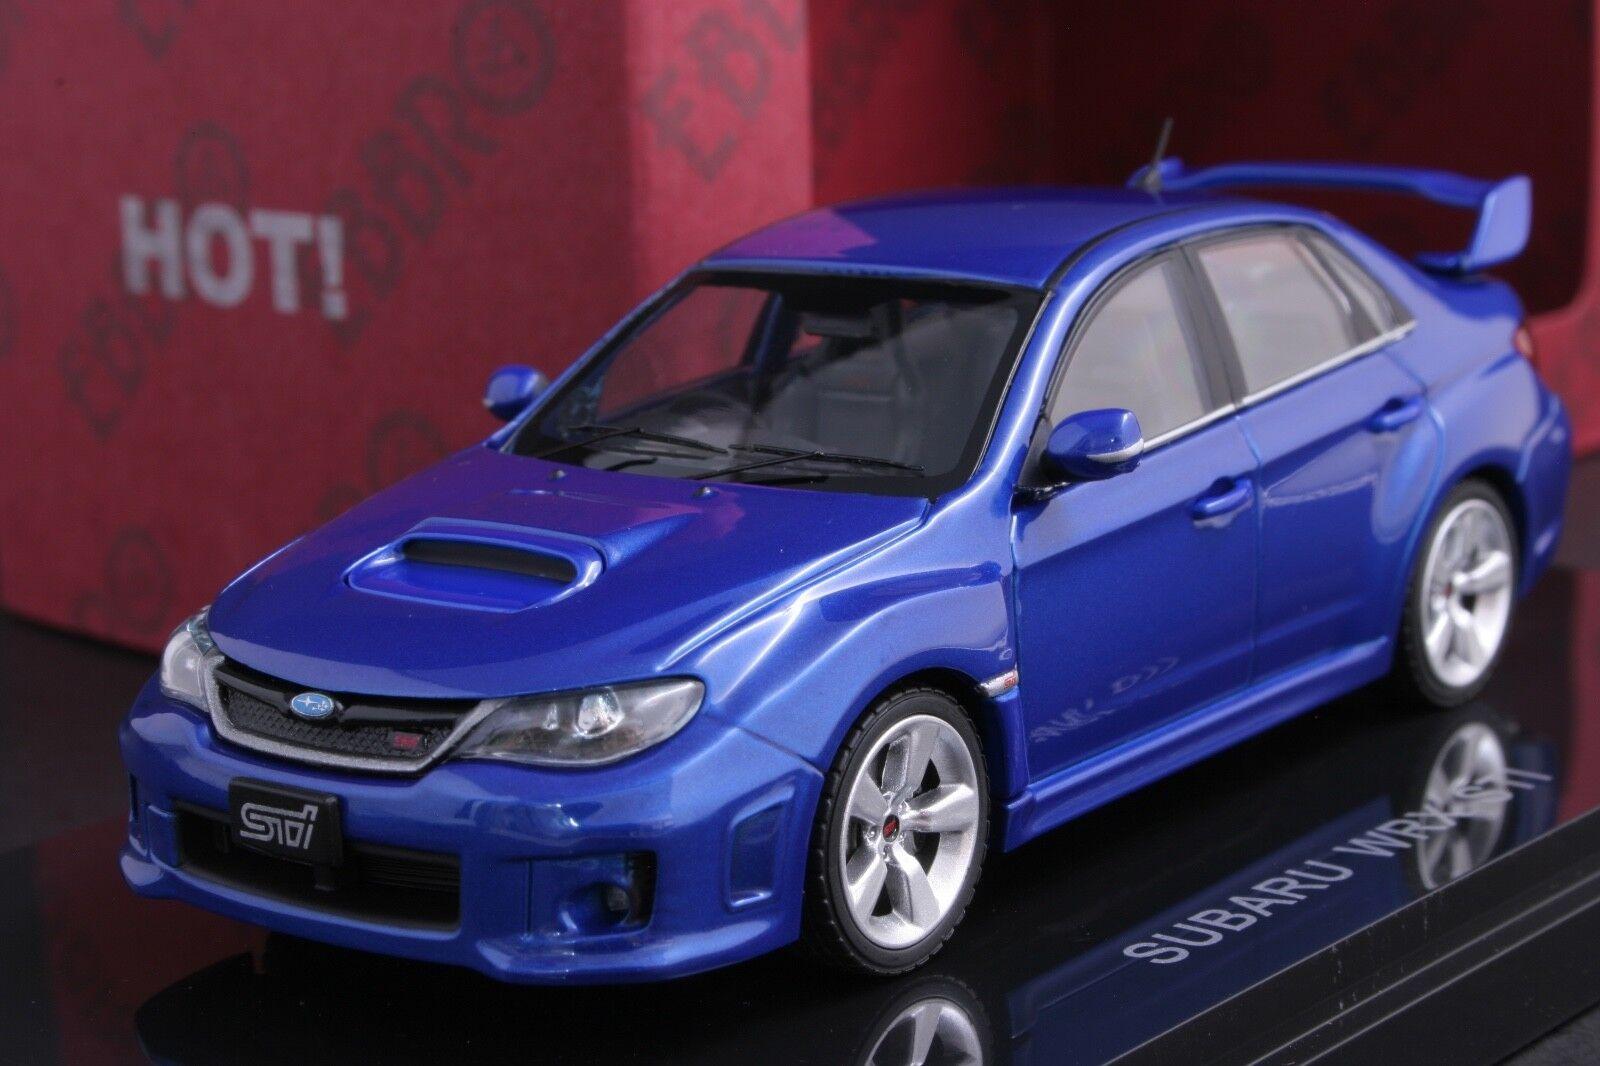 Ebbro 1 43 Subaru Impreza WRX STI Die Cast Modelo Sport Car (WRX blu Perla Mica)